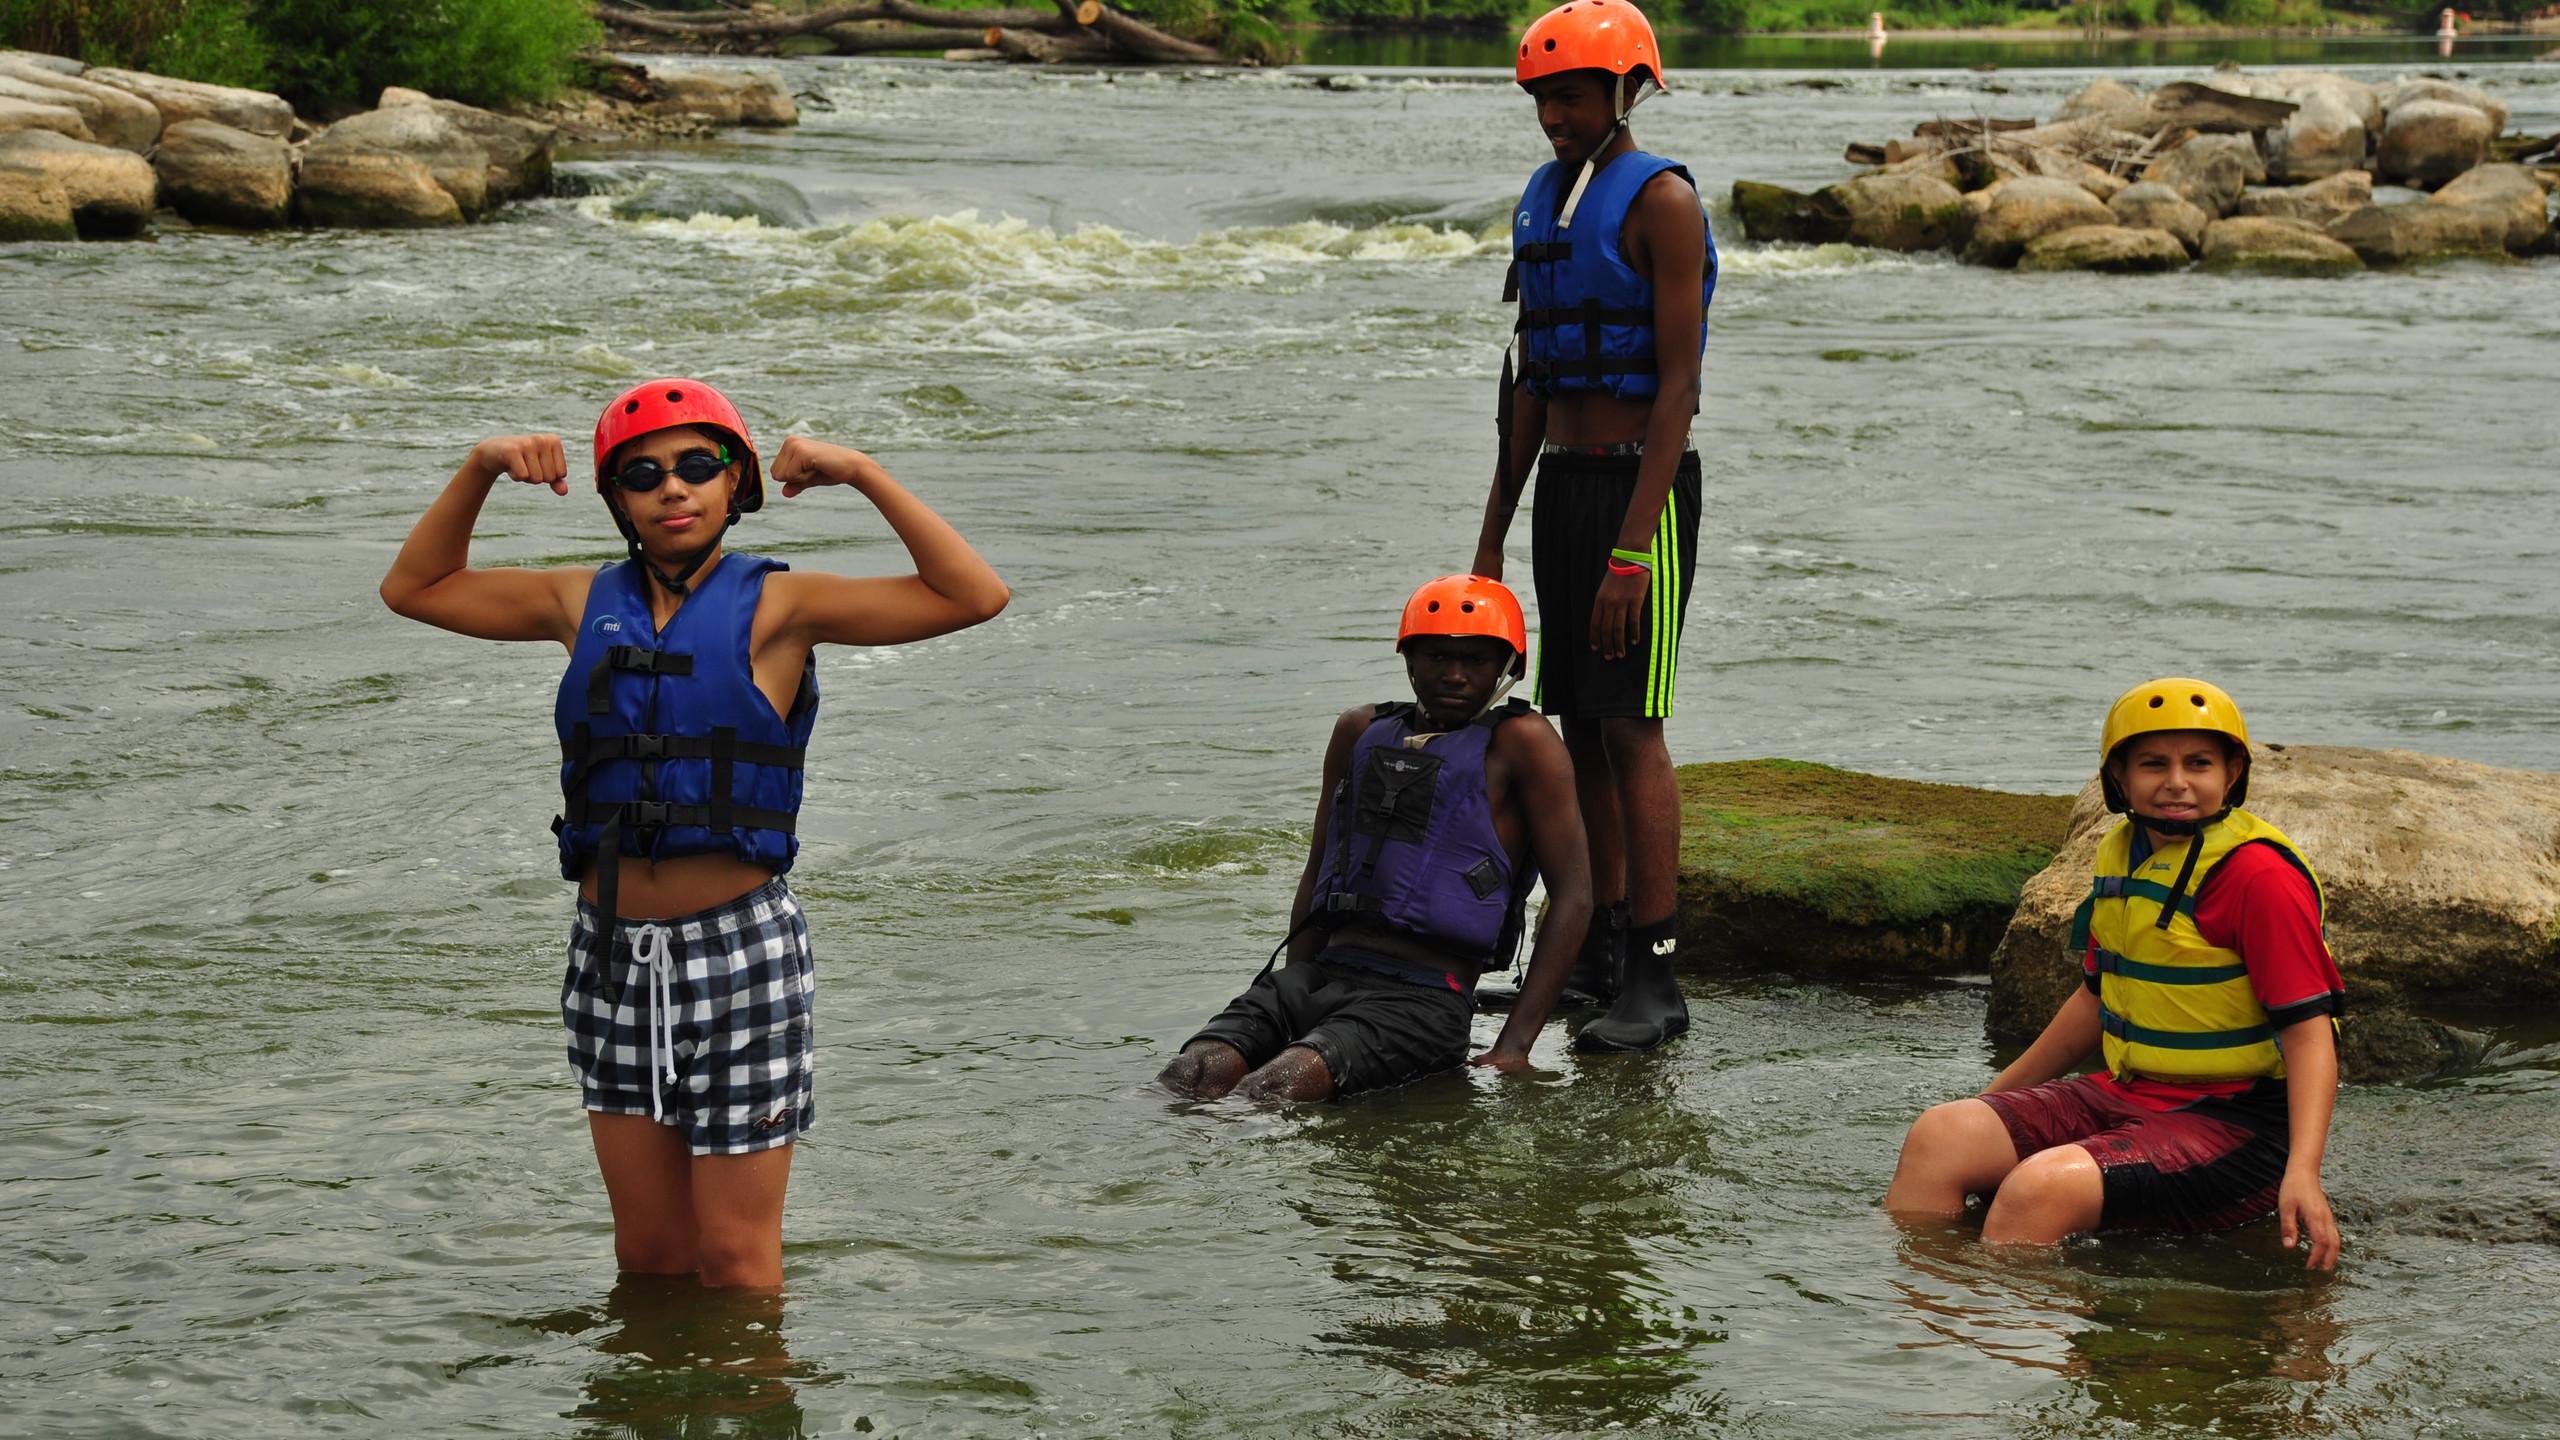 Whitewater Rafting - Summer 2017